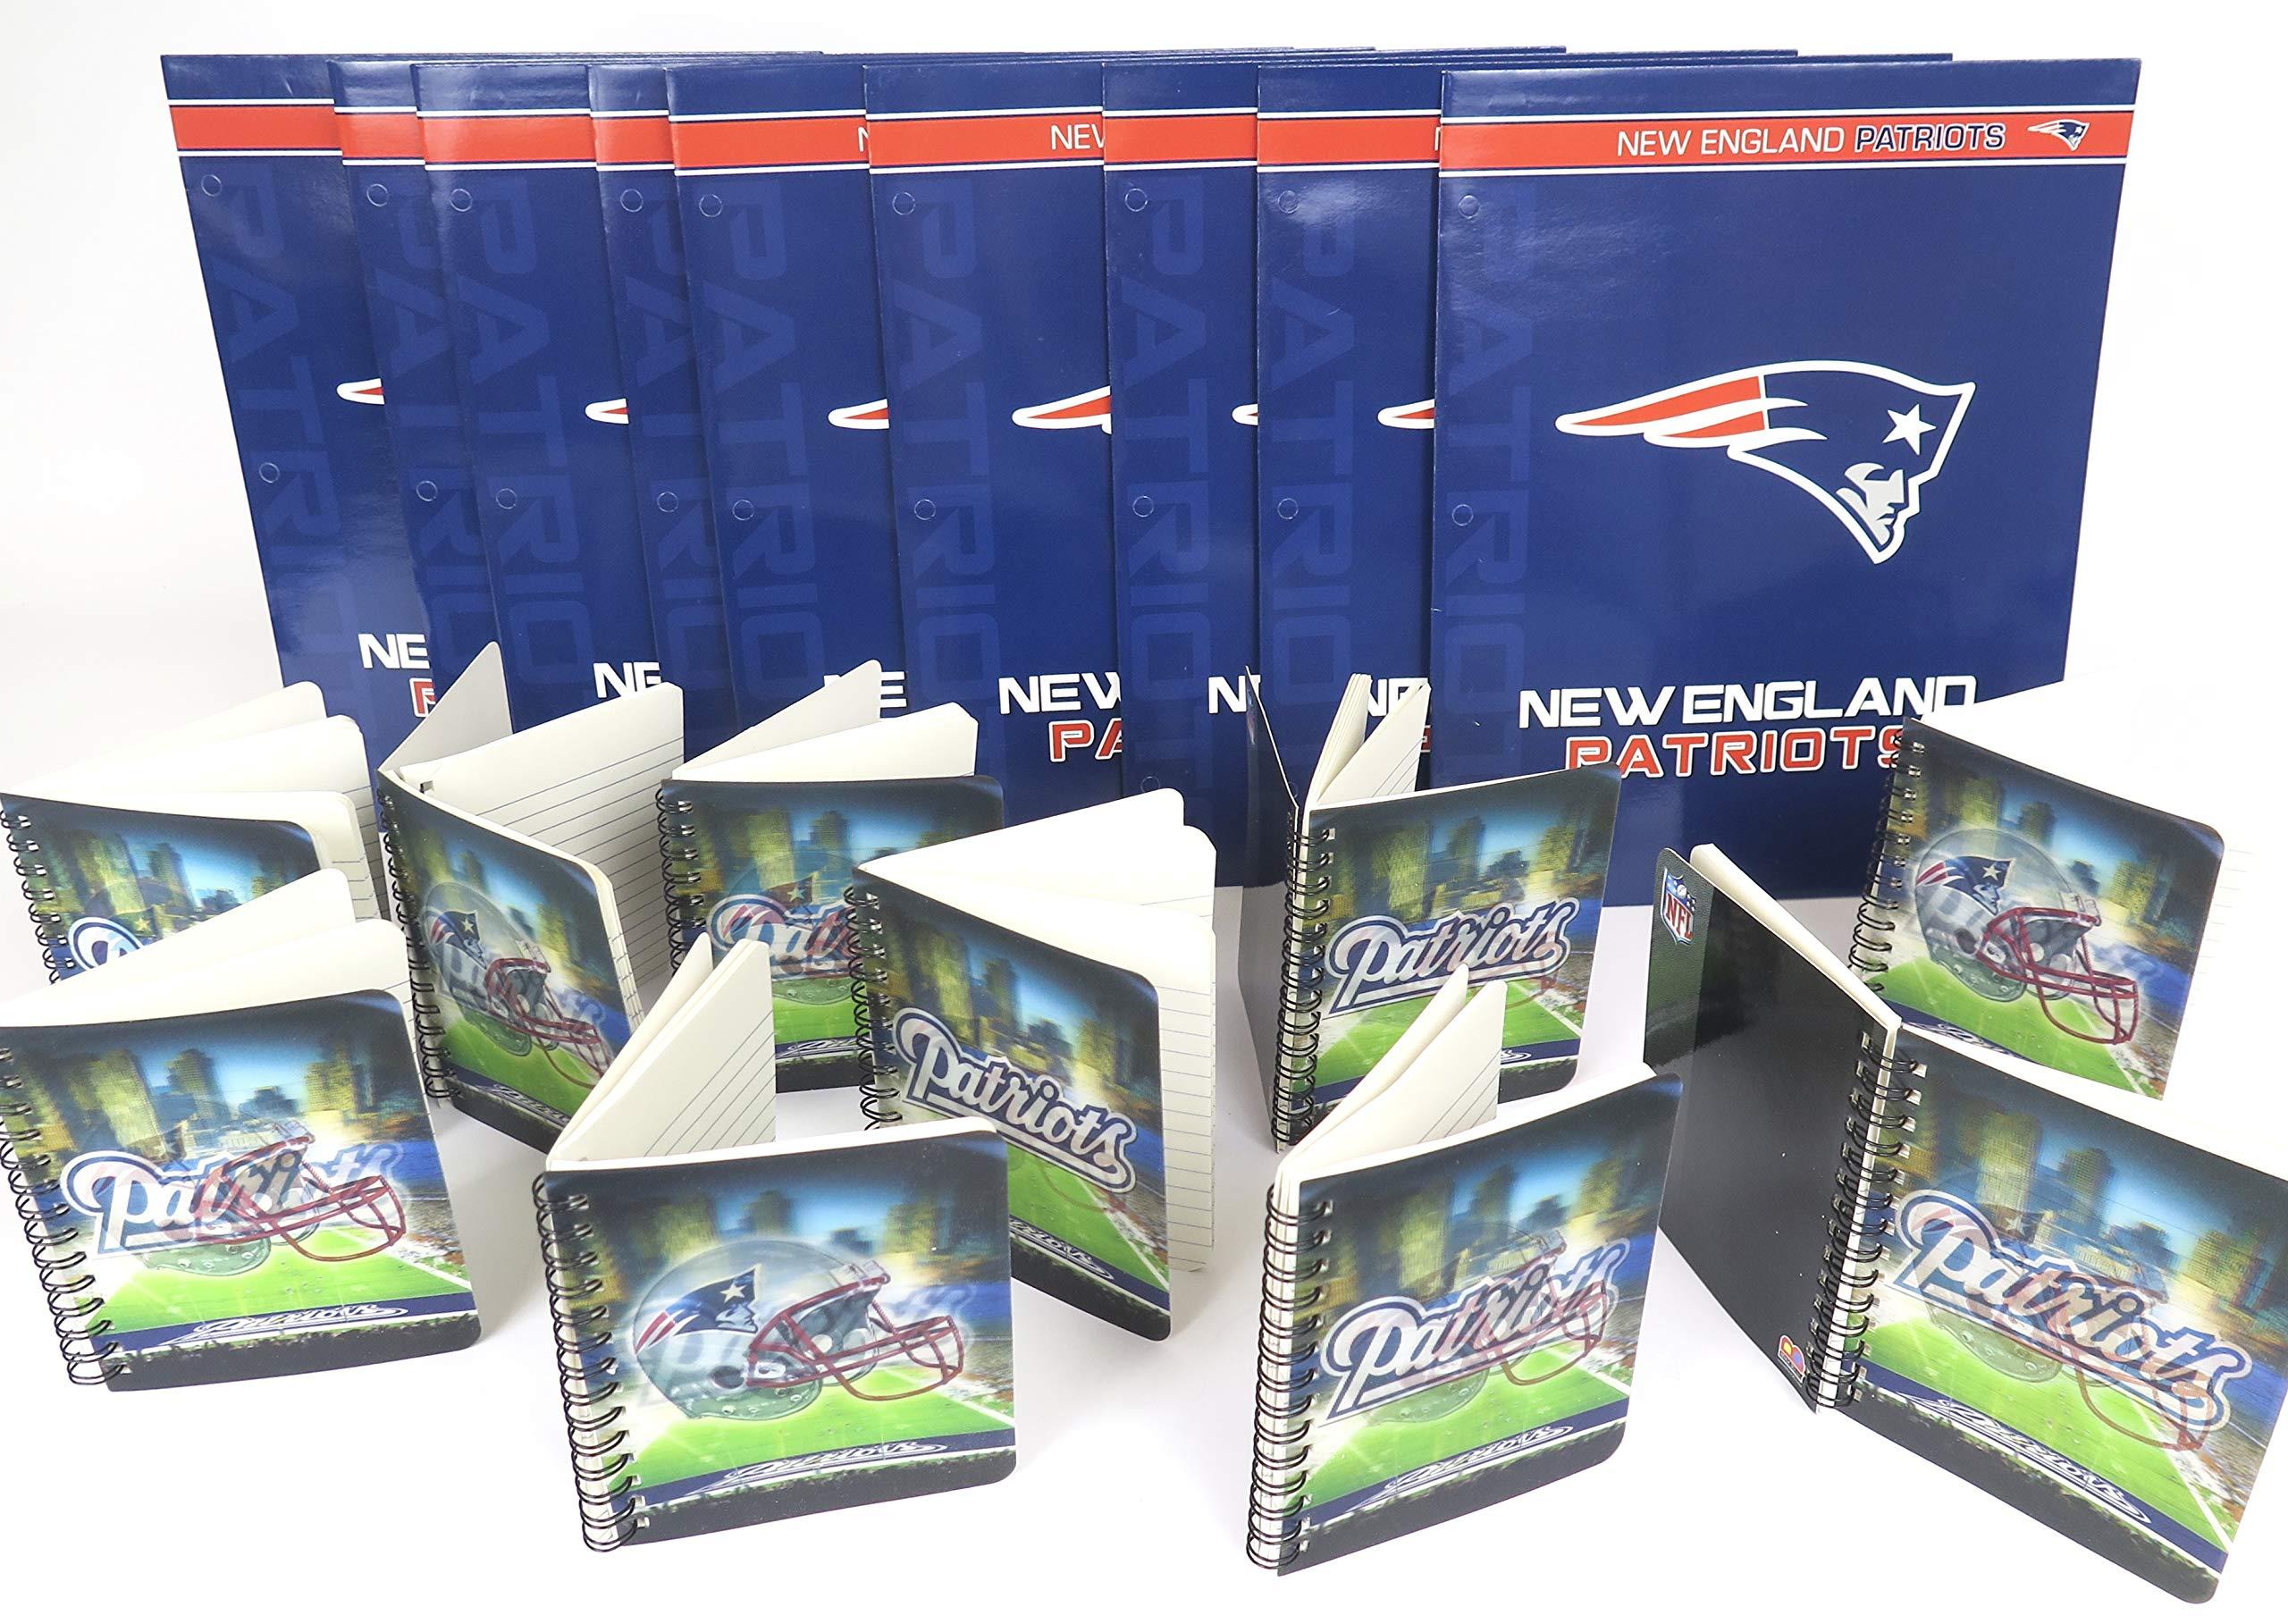 New England Patriots School Supplies set, 10 Memo Pads and 10 Folder.